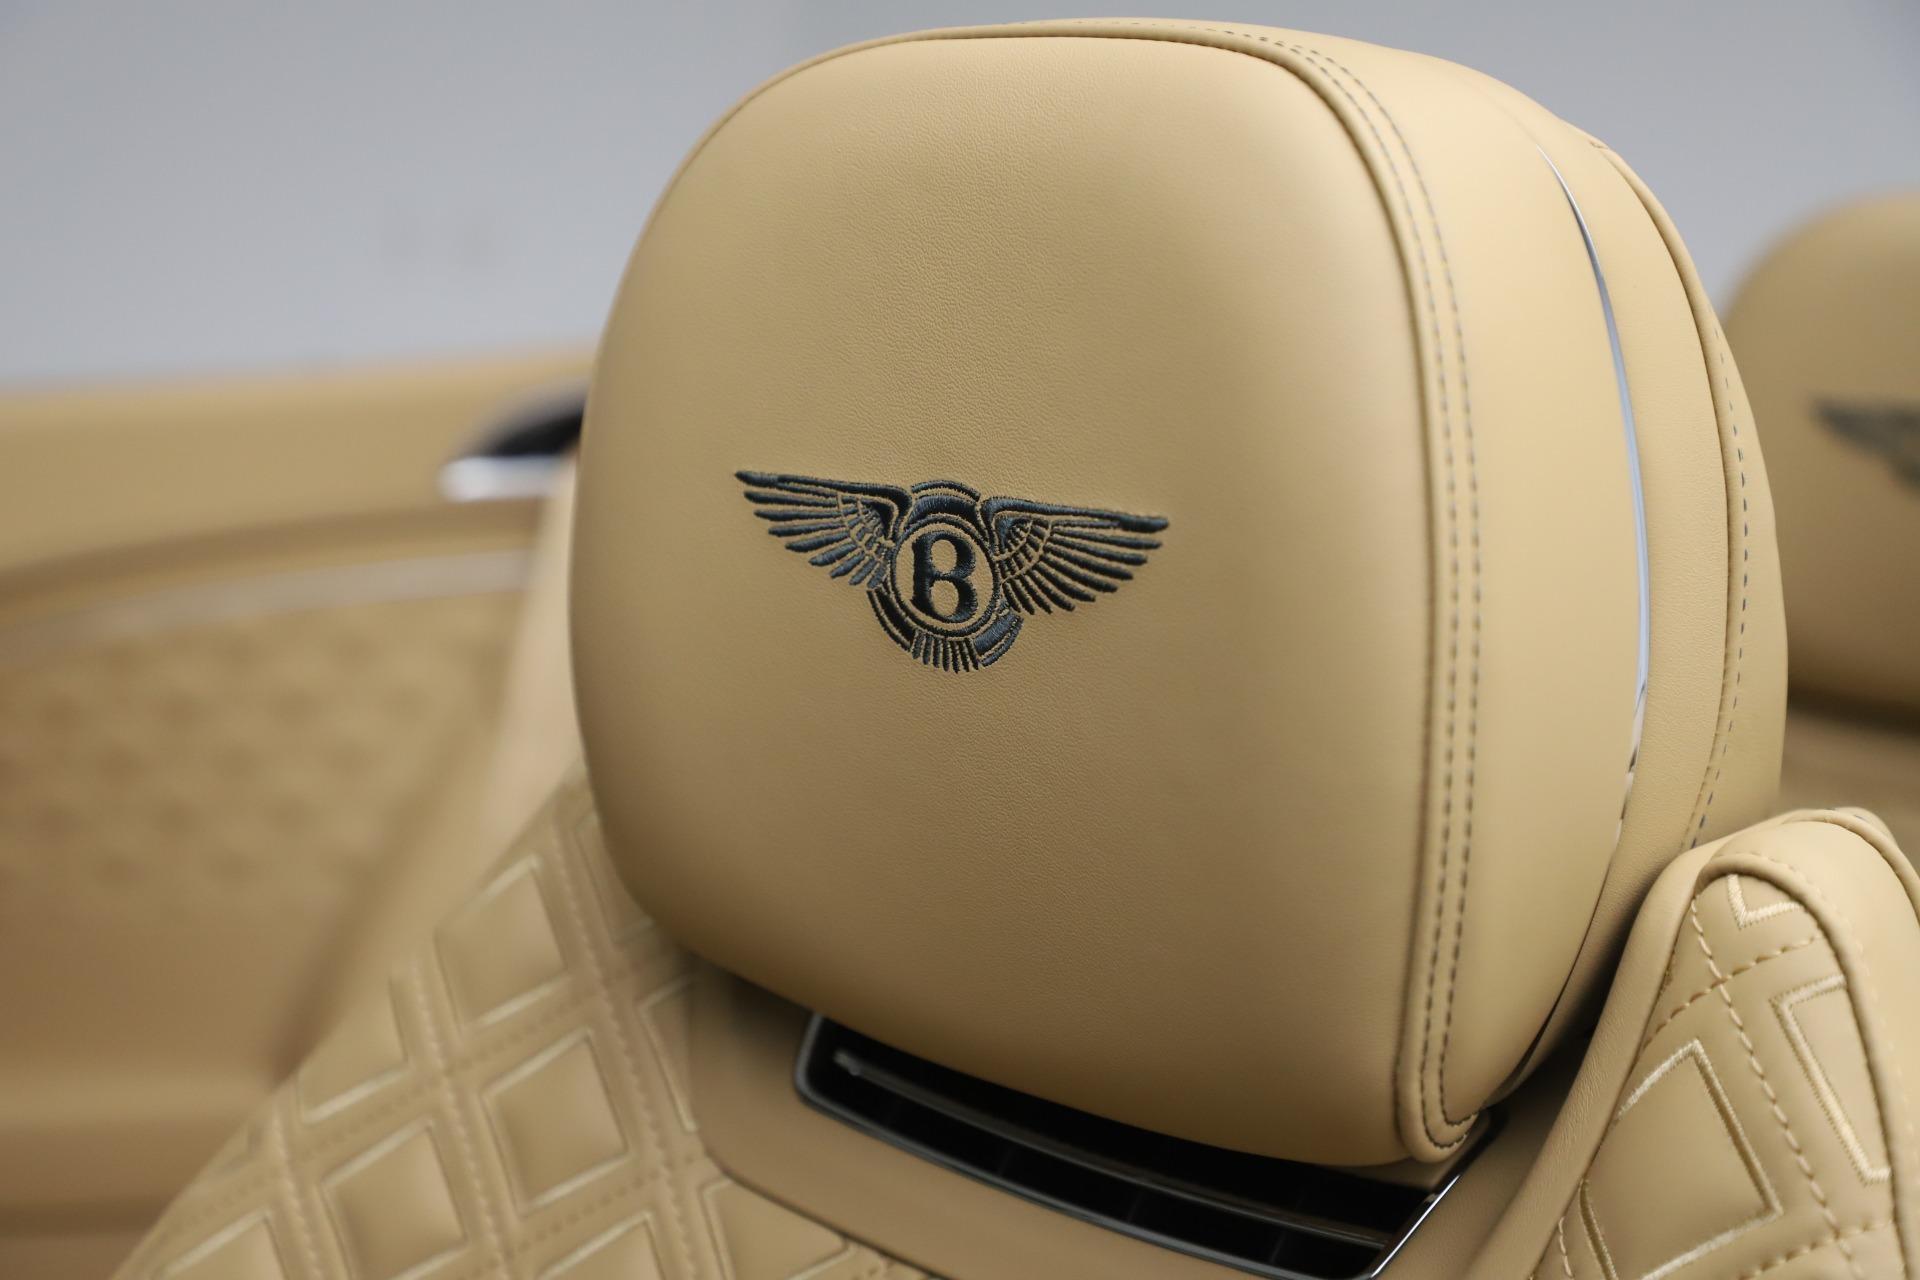 New 2020 Bentley Continental GTC V8 For Sale In Westport, CT 3572_p30